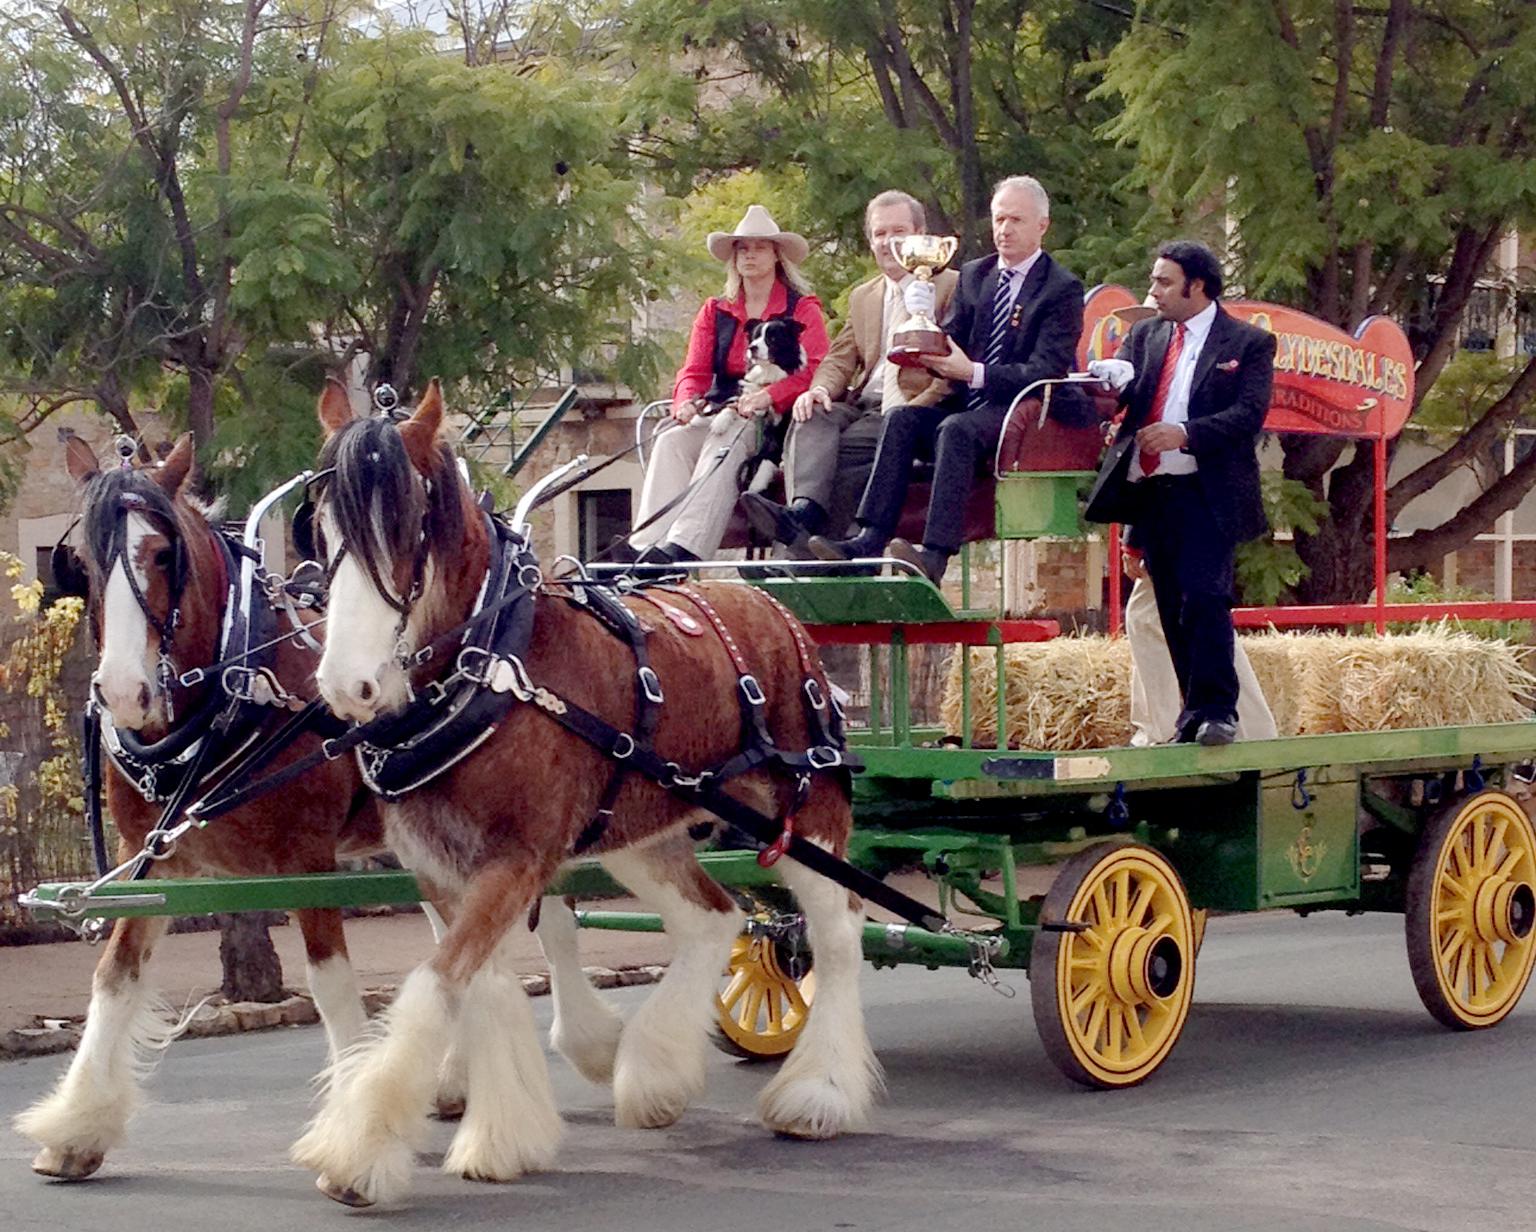 Melbourne Cup Parade York - Parades cropped.JPG